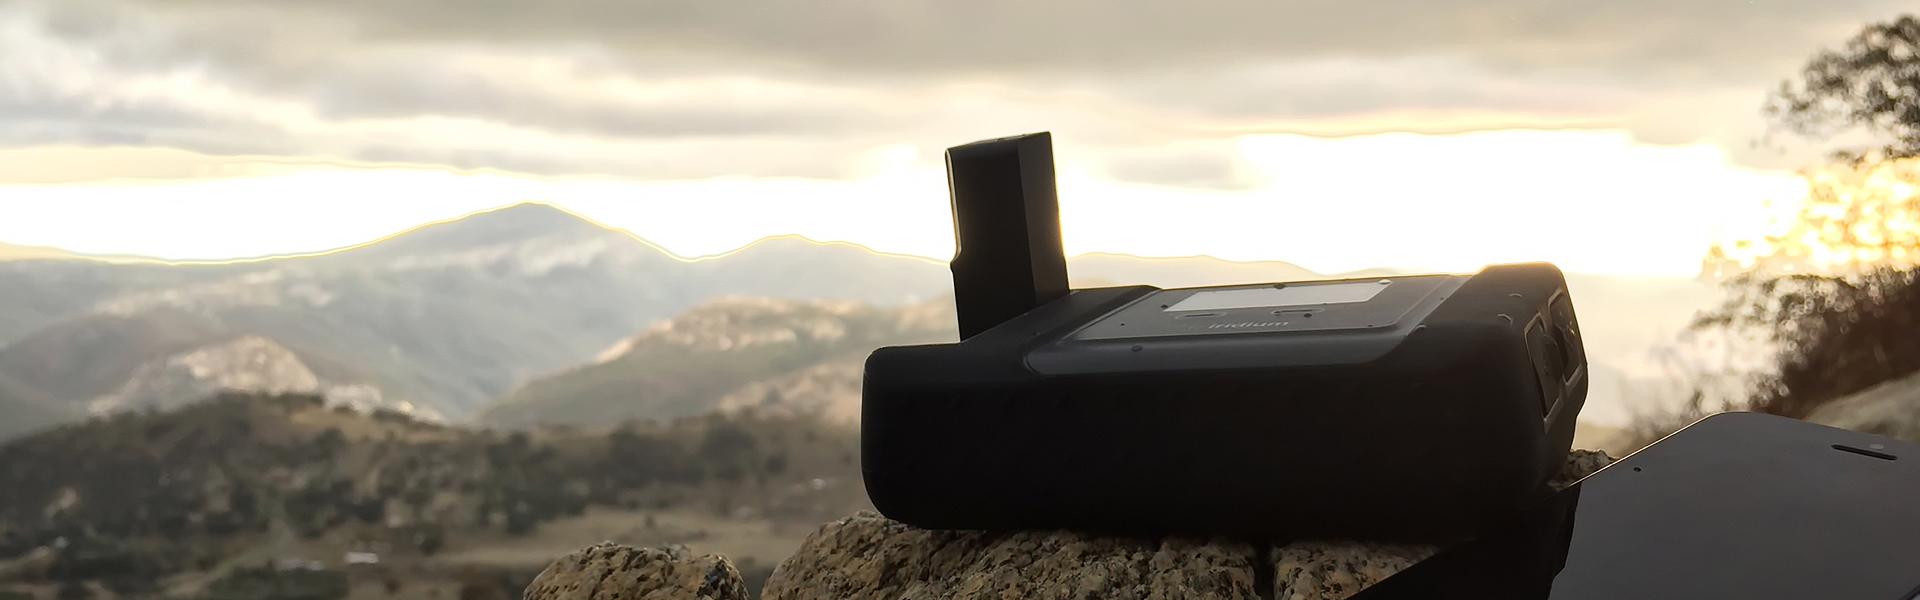 iridium go satellite smartphone wifi hotspot from NorthernAxcess